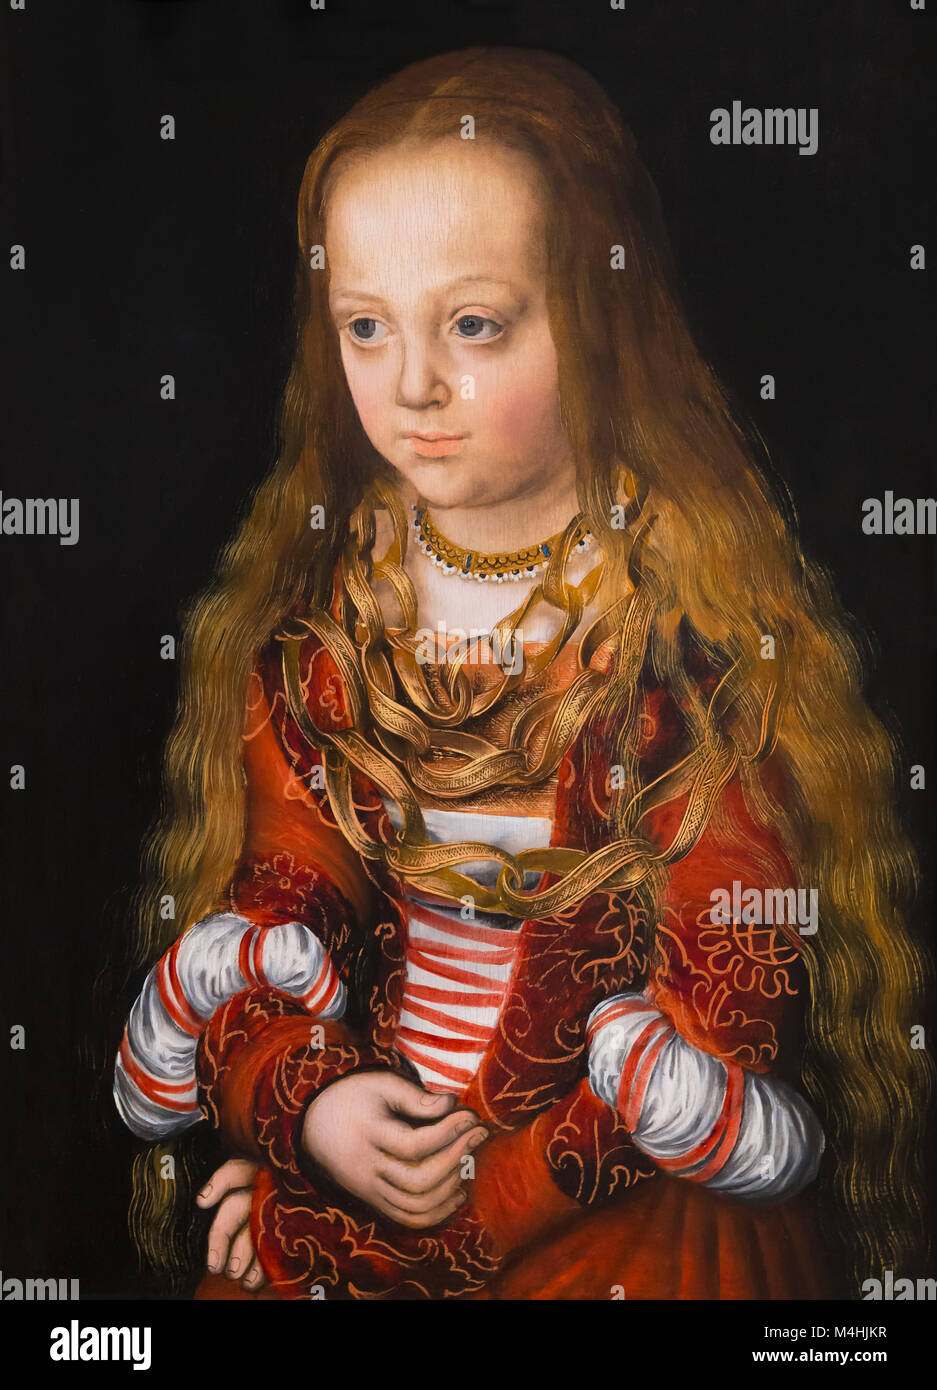 A Princess of Saxony, Lucas Cranach the Elder, circa 1516, National Gallery of Art, Washington DC, USA, North America - Stock Image